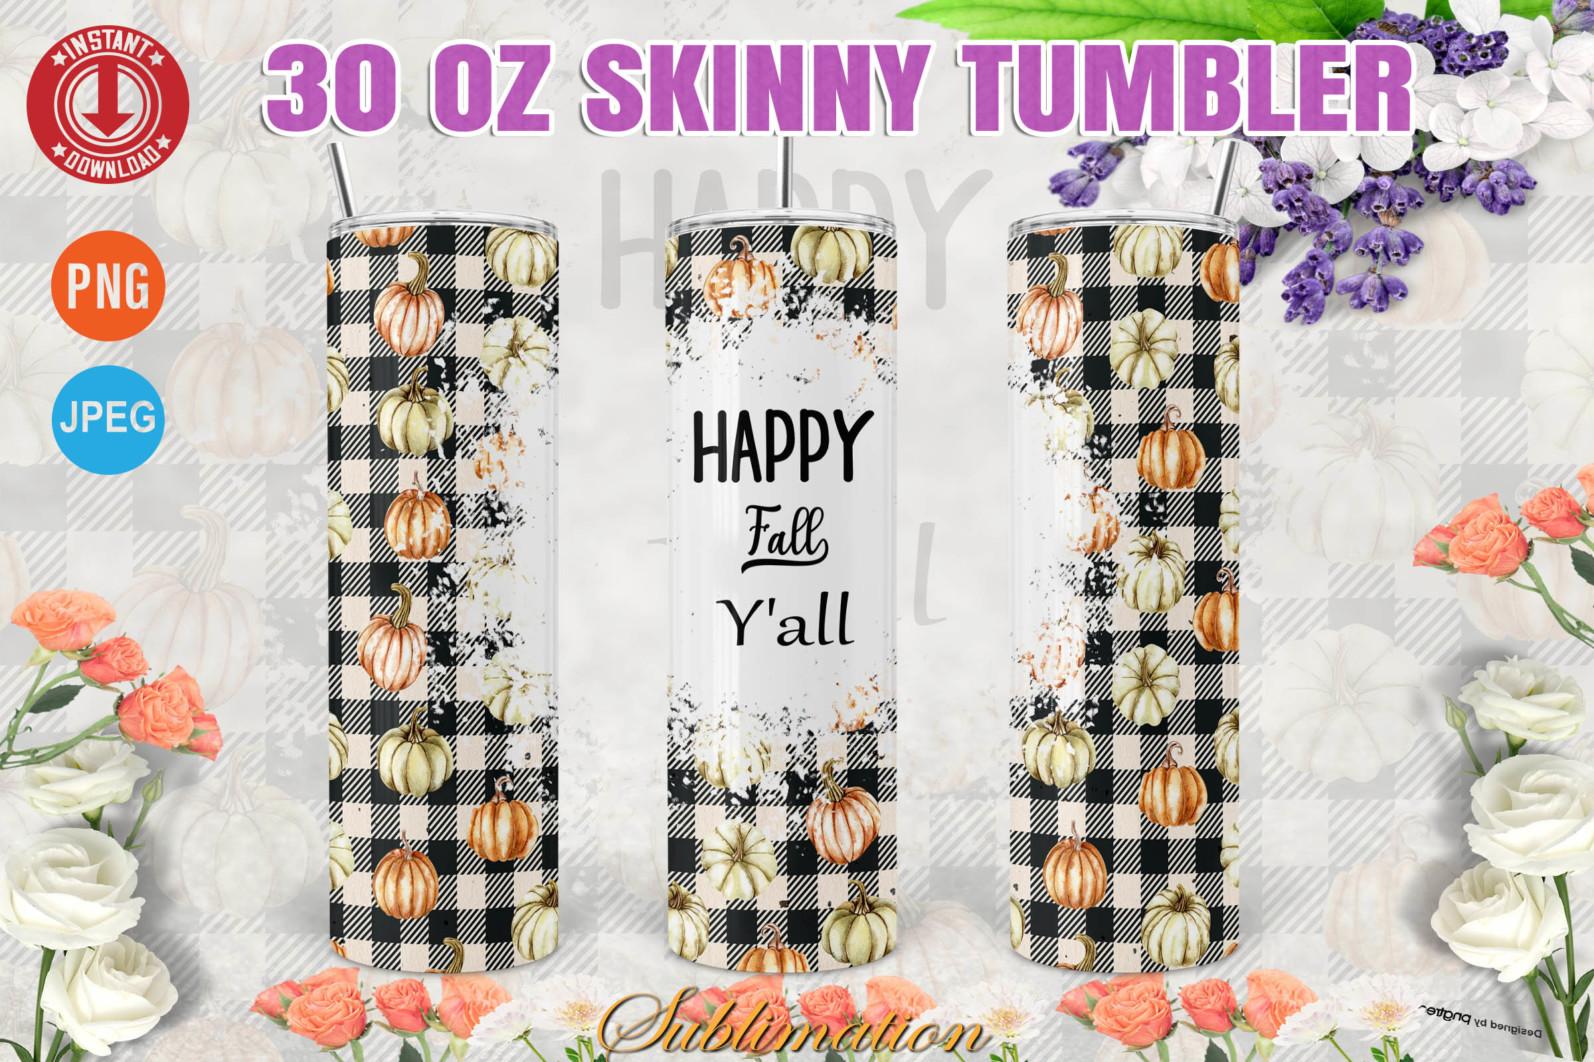 Happy Fall Y'all Plaid 30oz Skinny tumbler Thanksgiving - PHOTOSHOP30ozSkinnyWrap copy 1 -